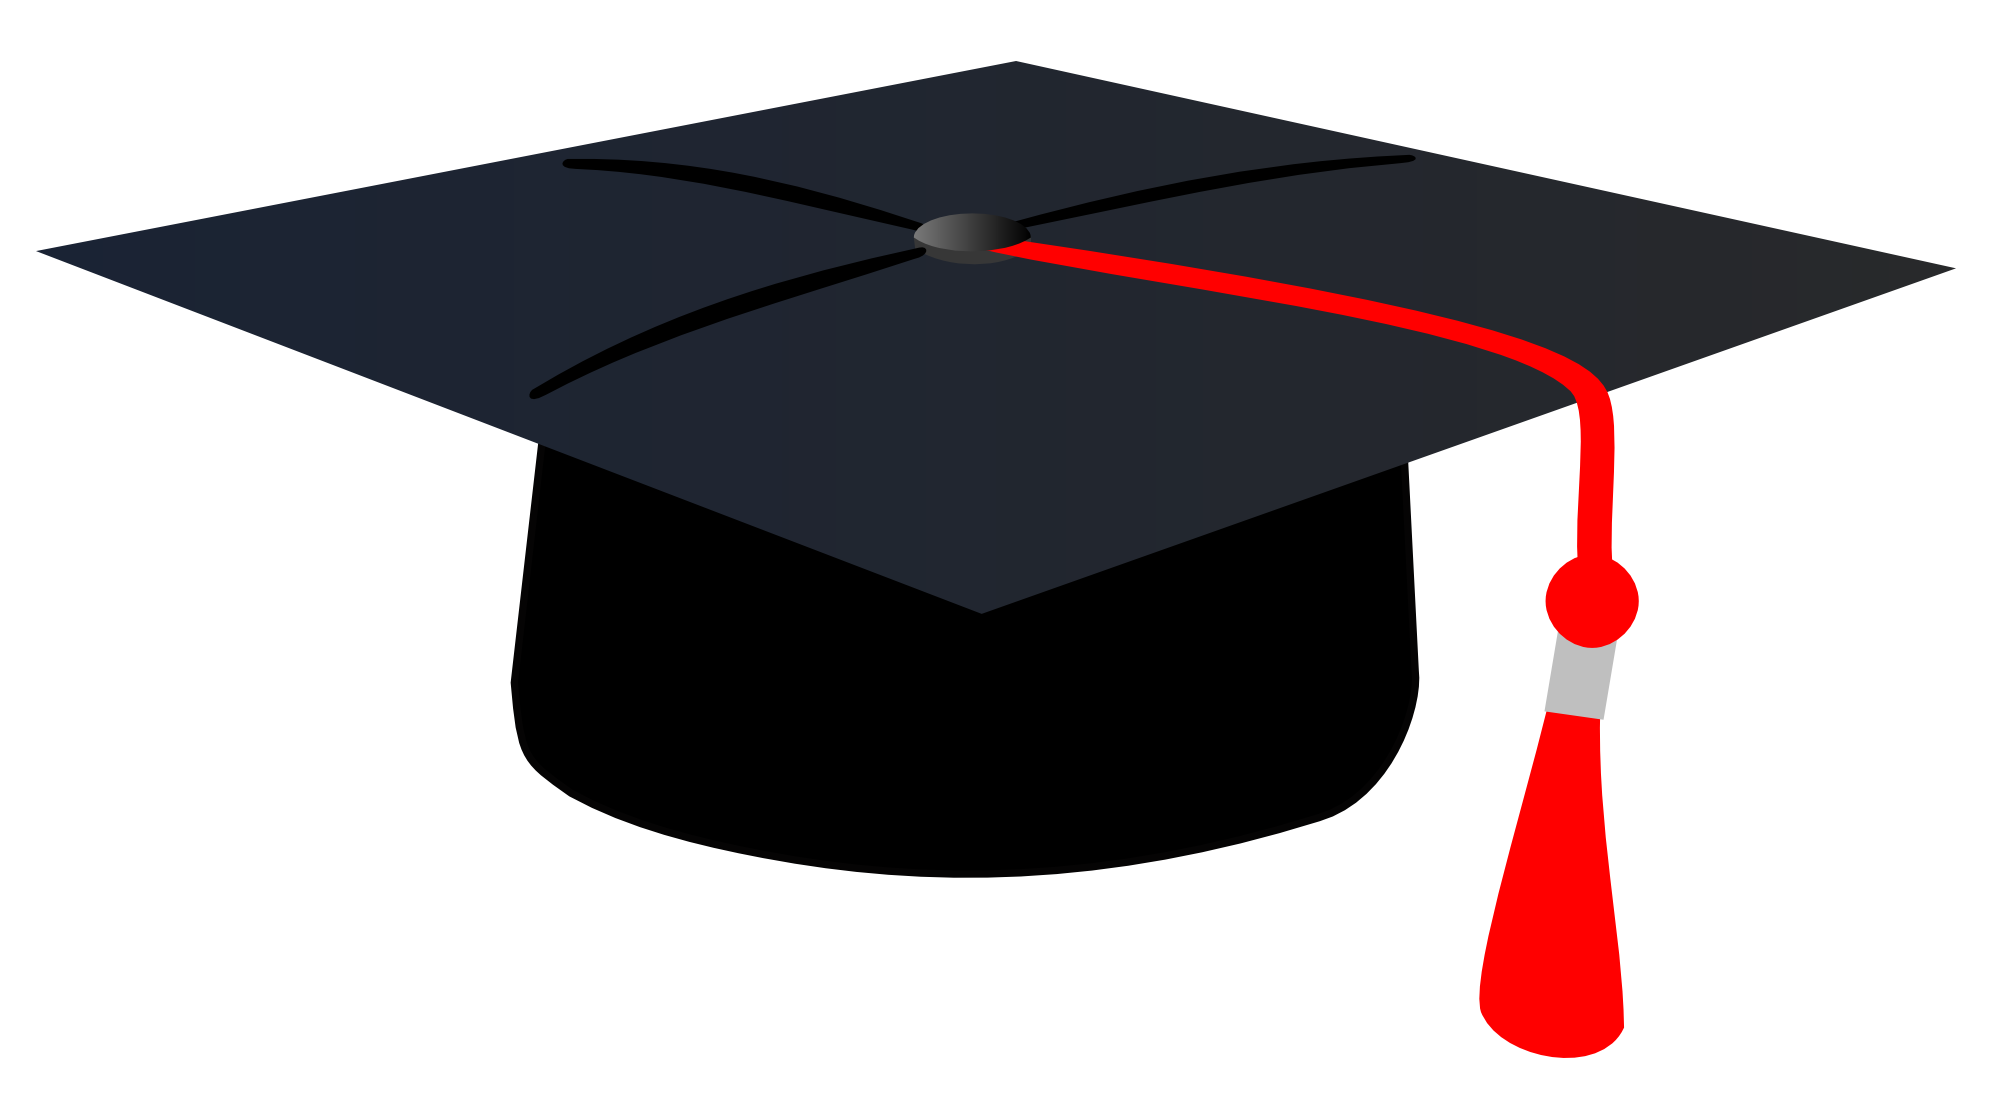 graduation cap clipart png image purepng free transparent cc0 rh purepng com graduation cap clipart 2018 graduation cap clip art black and white